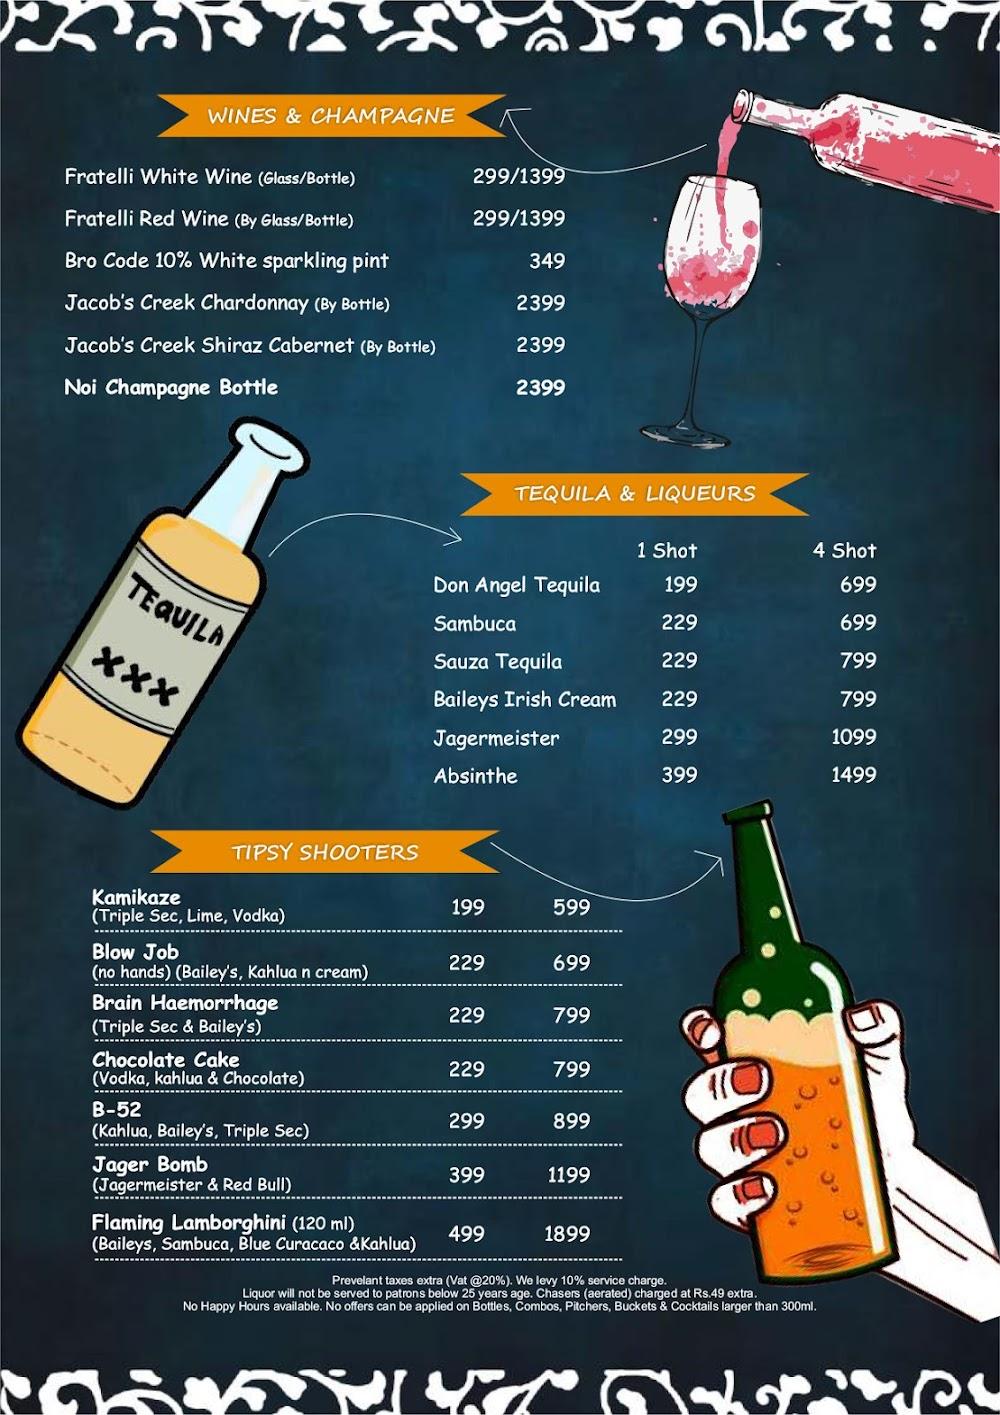 Chill'm Bar & Cafe menu 6